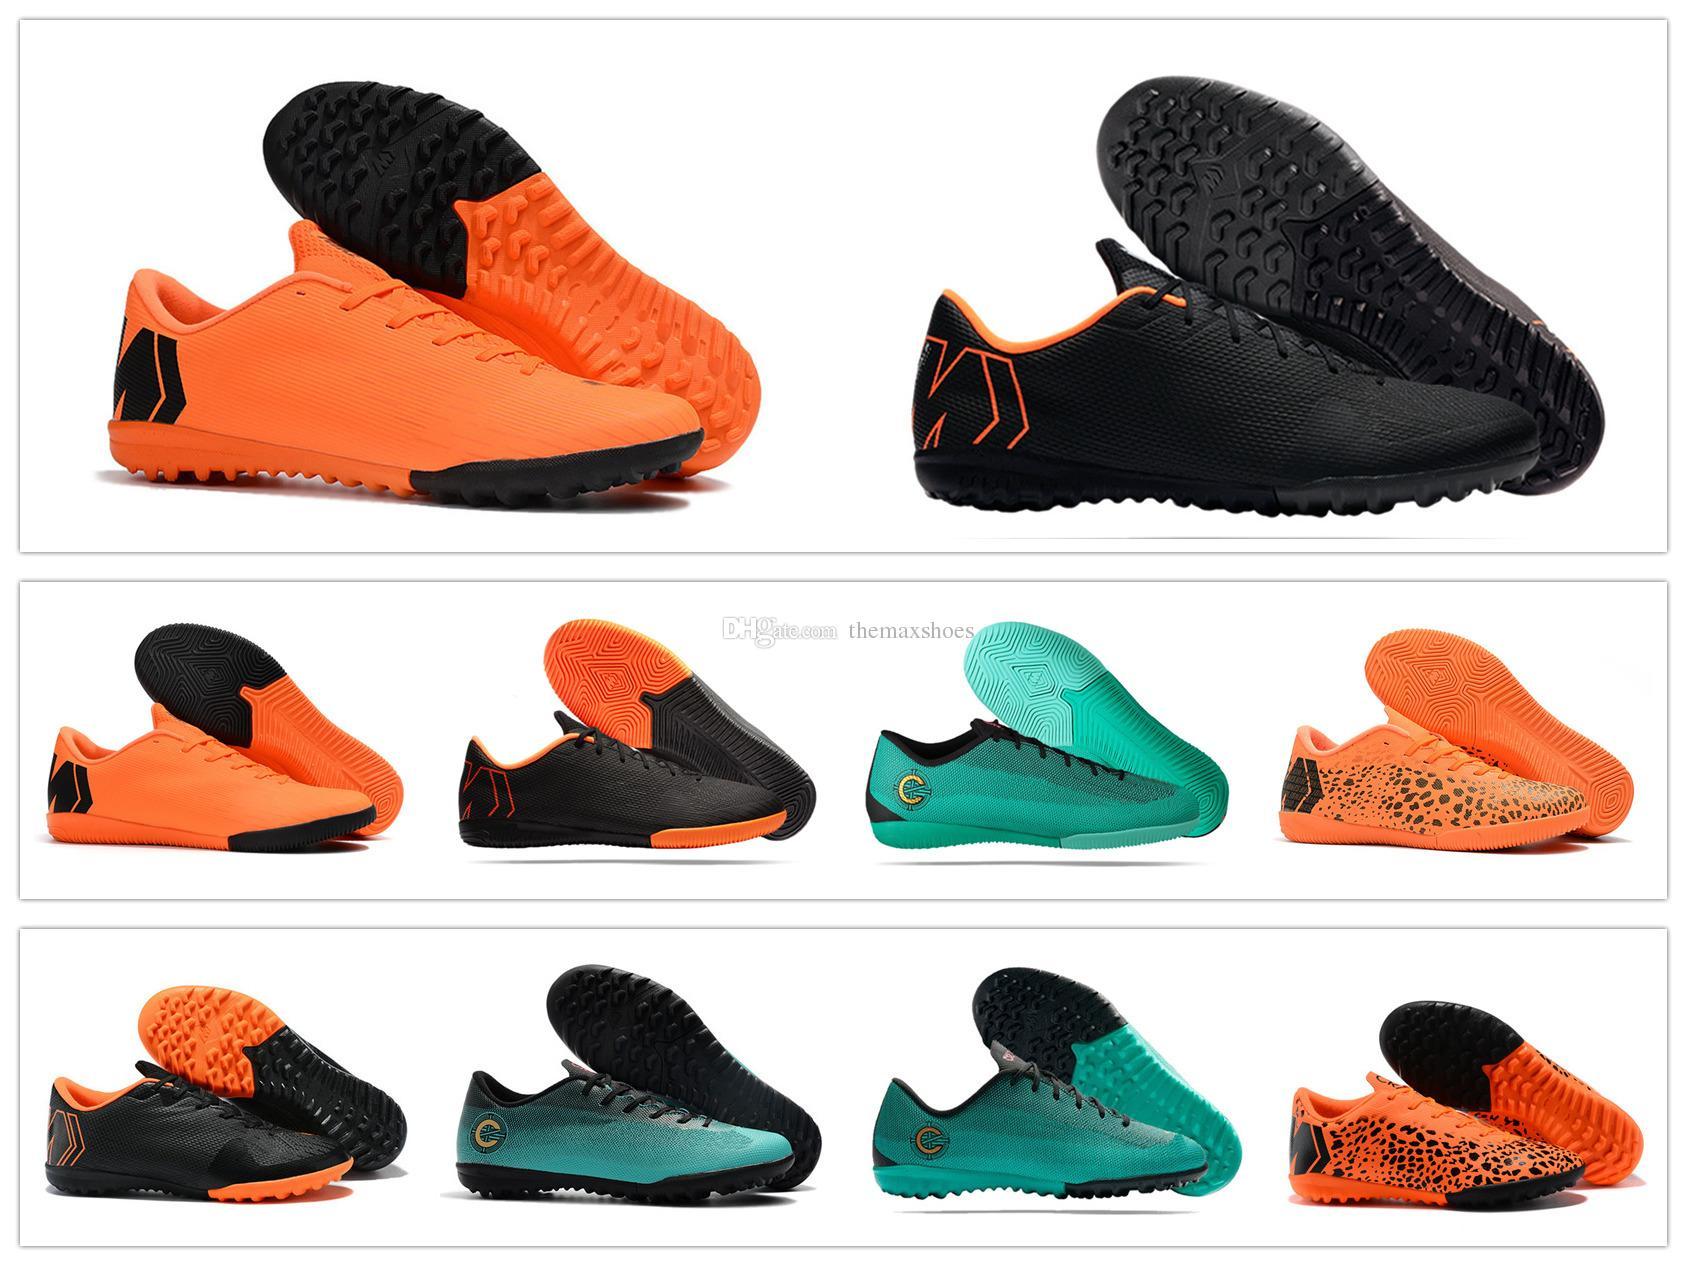 2018 Mercurial VaporX XII 12 Academy CR7 Cristiano Ronaldo TF IC Club  Superfly Soccer Shoes Generation Football Cleats Soccer Boots 39 45 Canada  2018 From ... df8c4b4aa0350